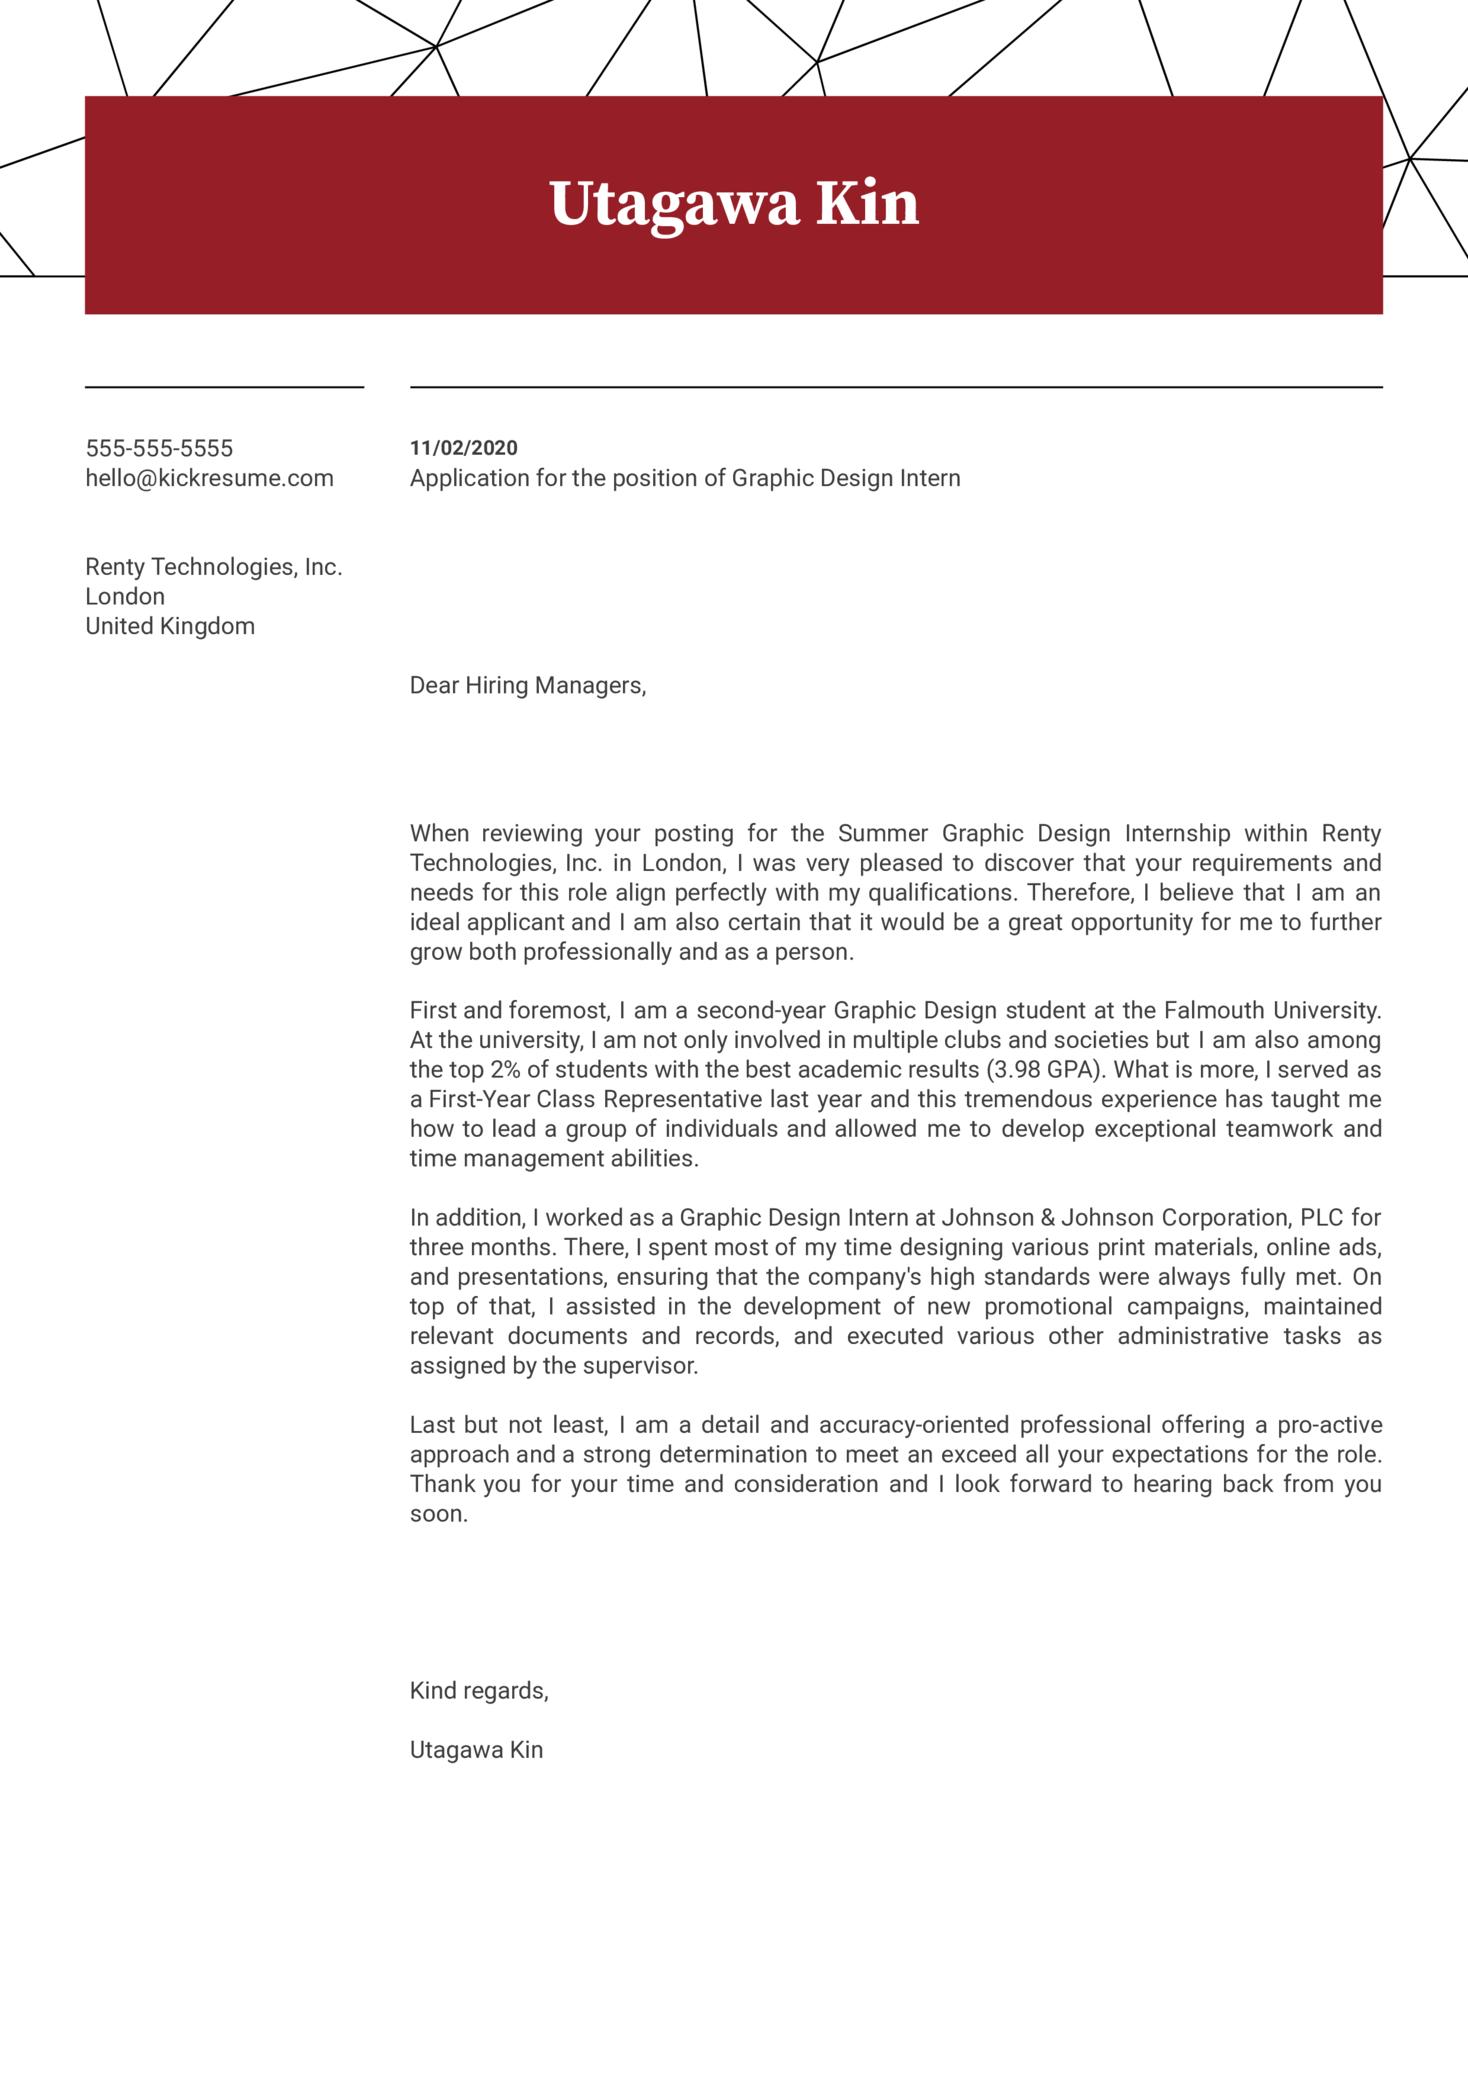 Graphic Design Internship Cover Letter Example